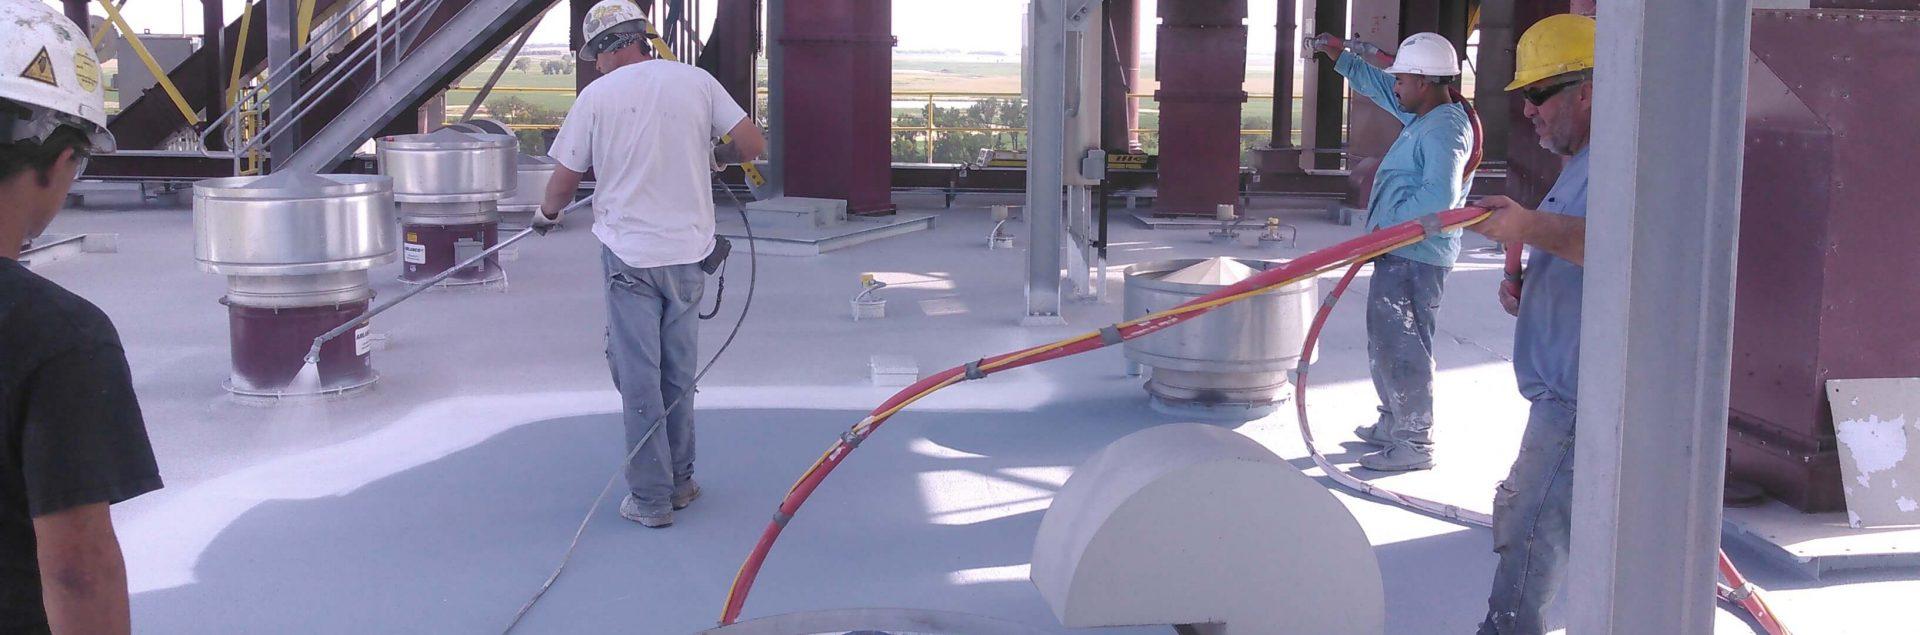 100 surecoat roof coating asphalt cap sheet over for 1234 get your booty on the floor